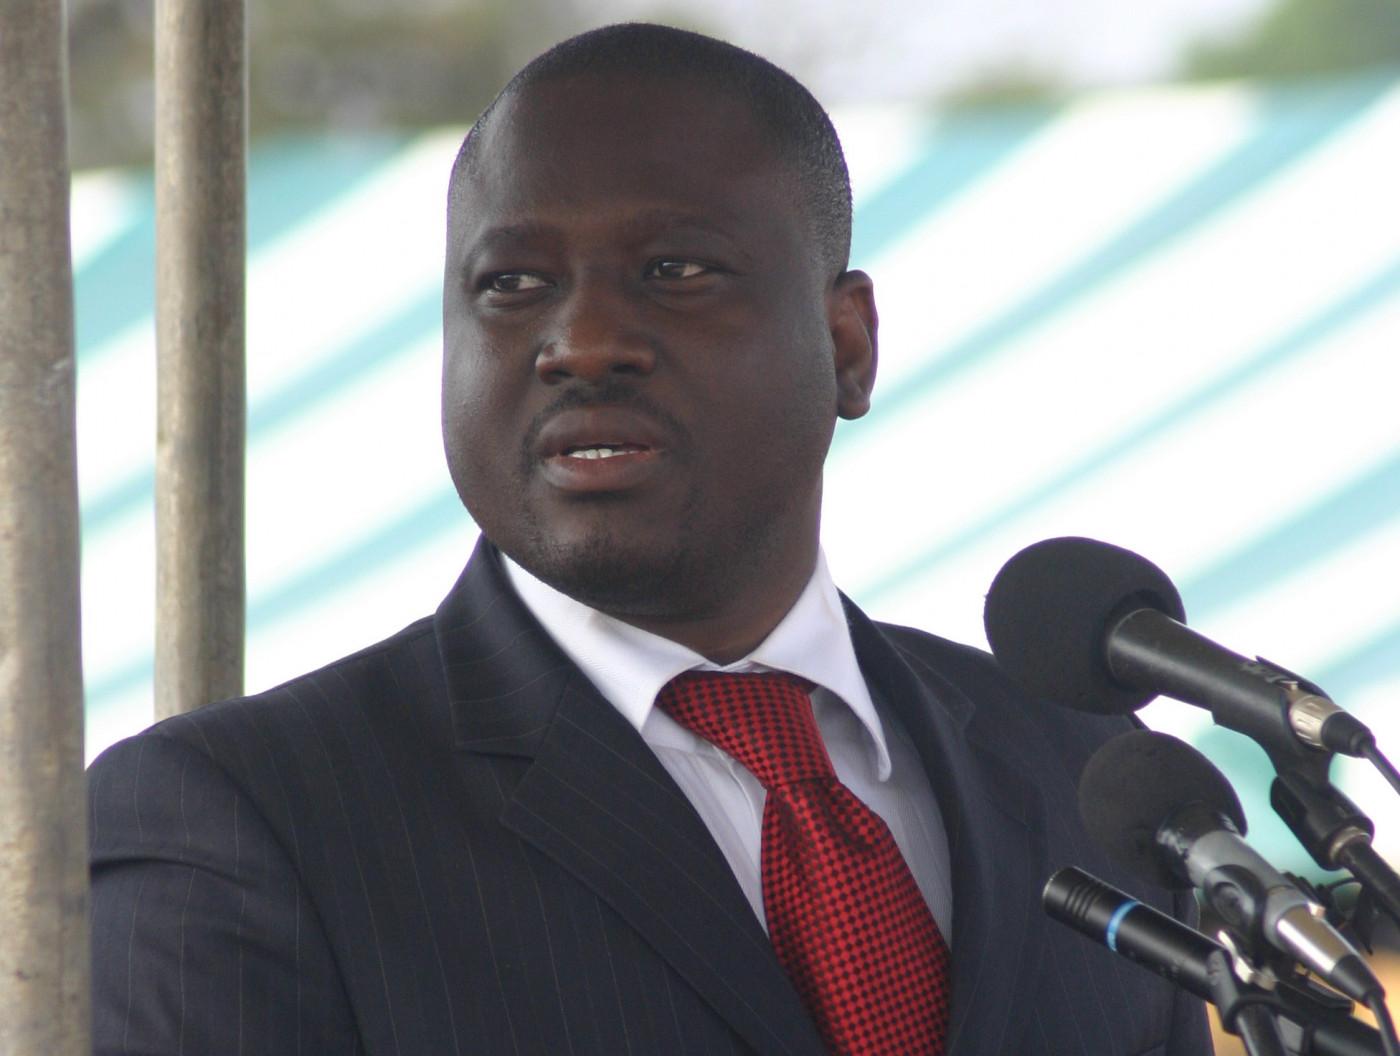 Guillaume Soro ex-primeiro-ministro da costa do marfim